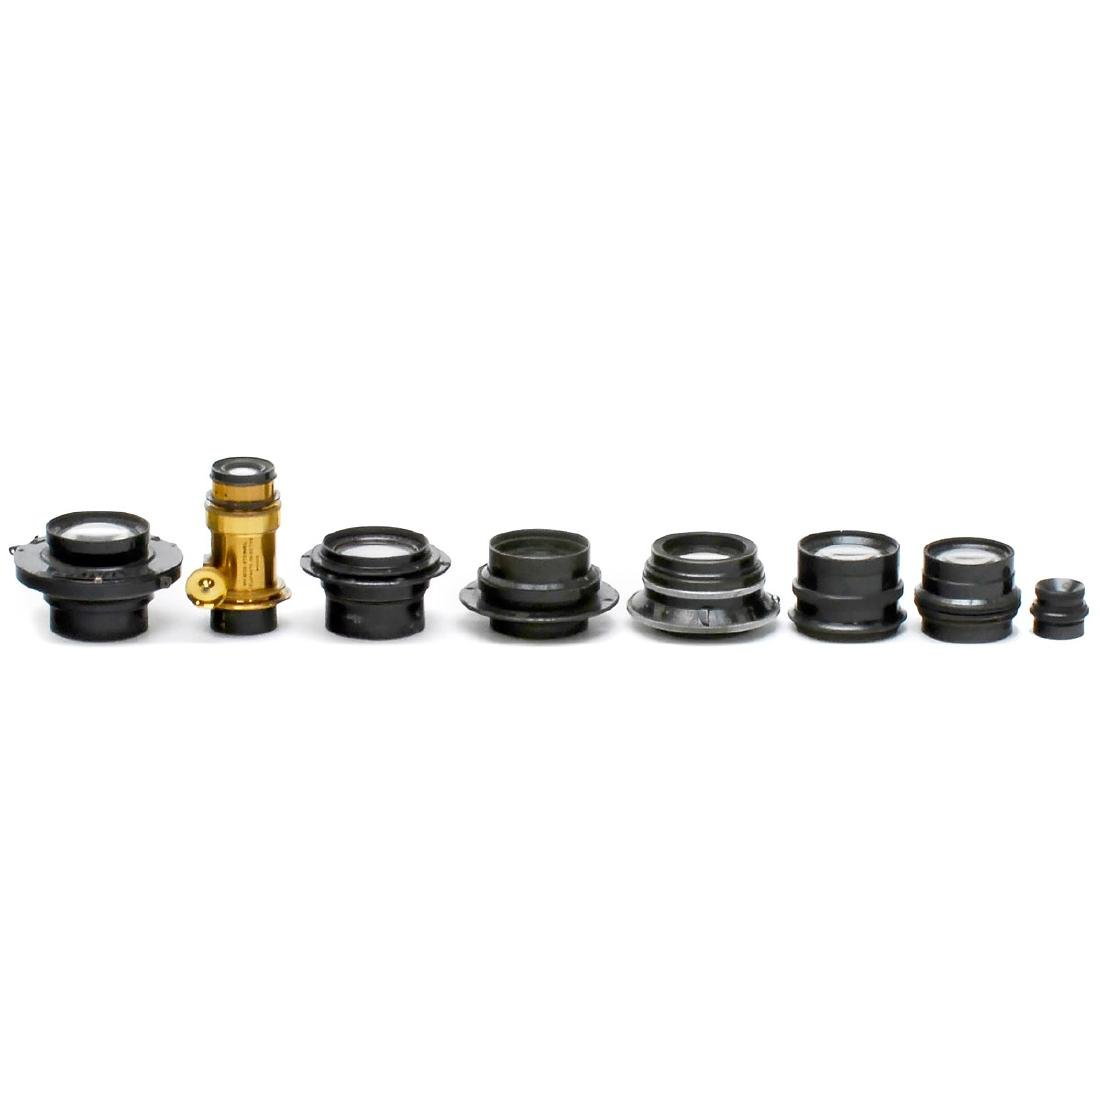 20 Lenses (Various Manufacturers) - 3